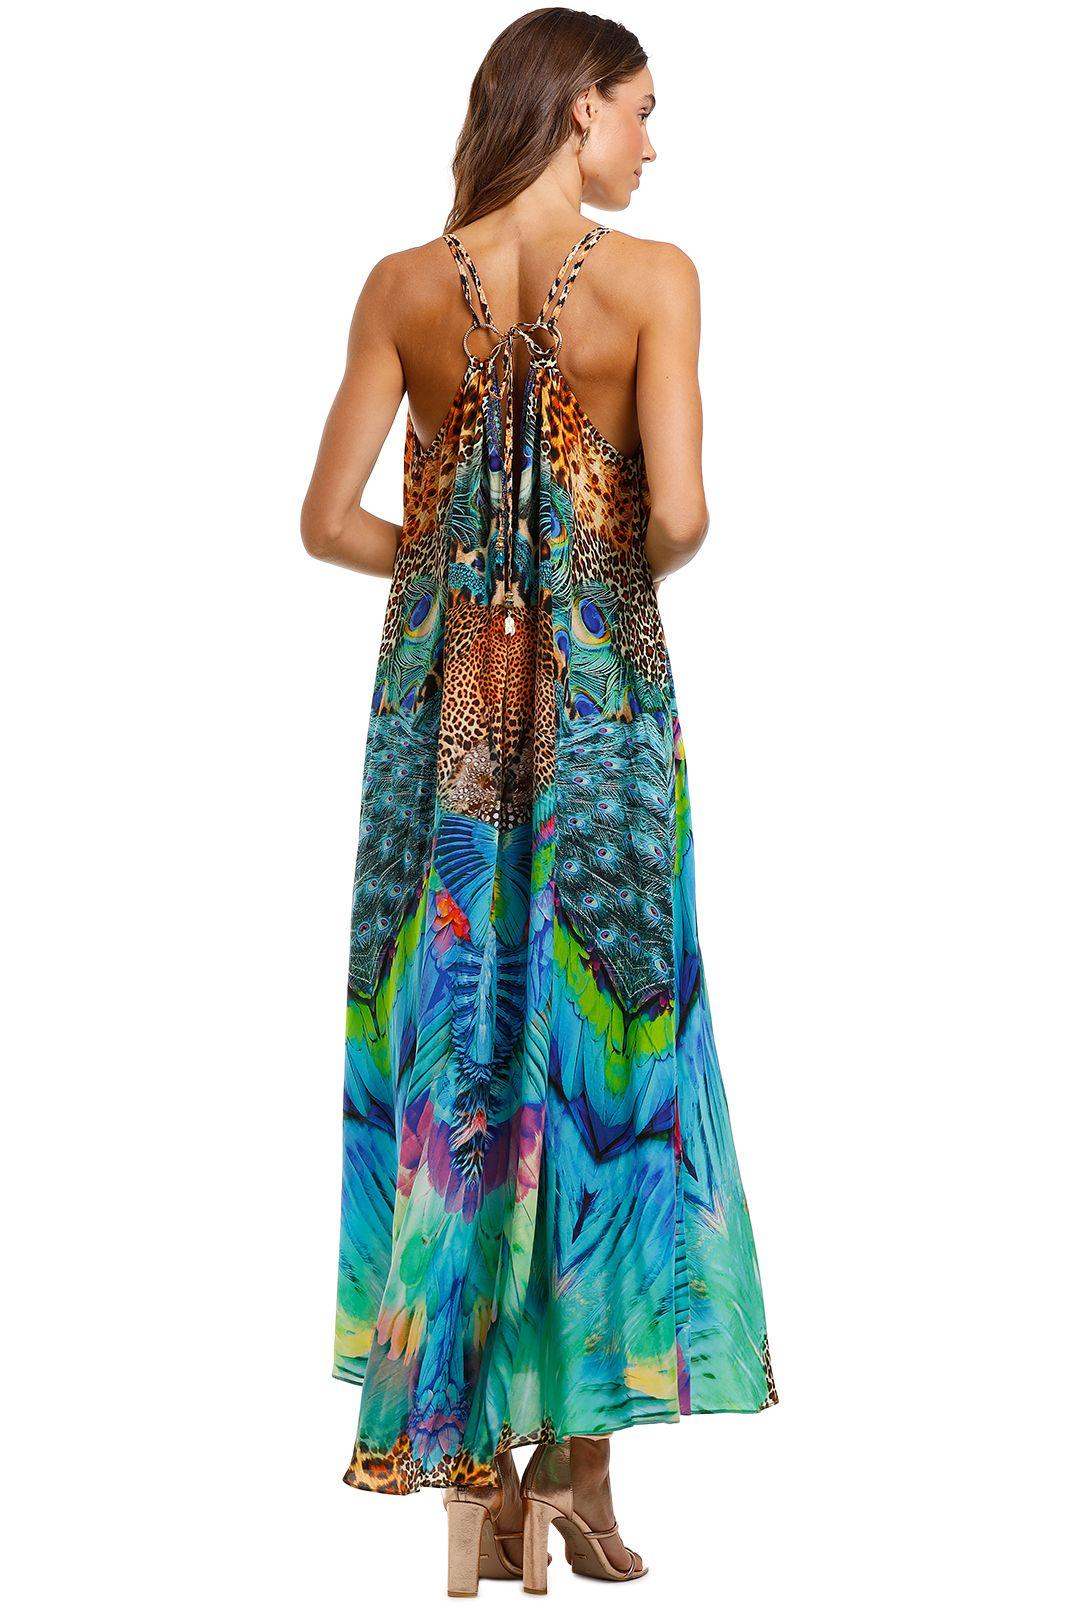 Camilla Ring Detail Strap Dress Boho V Neck